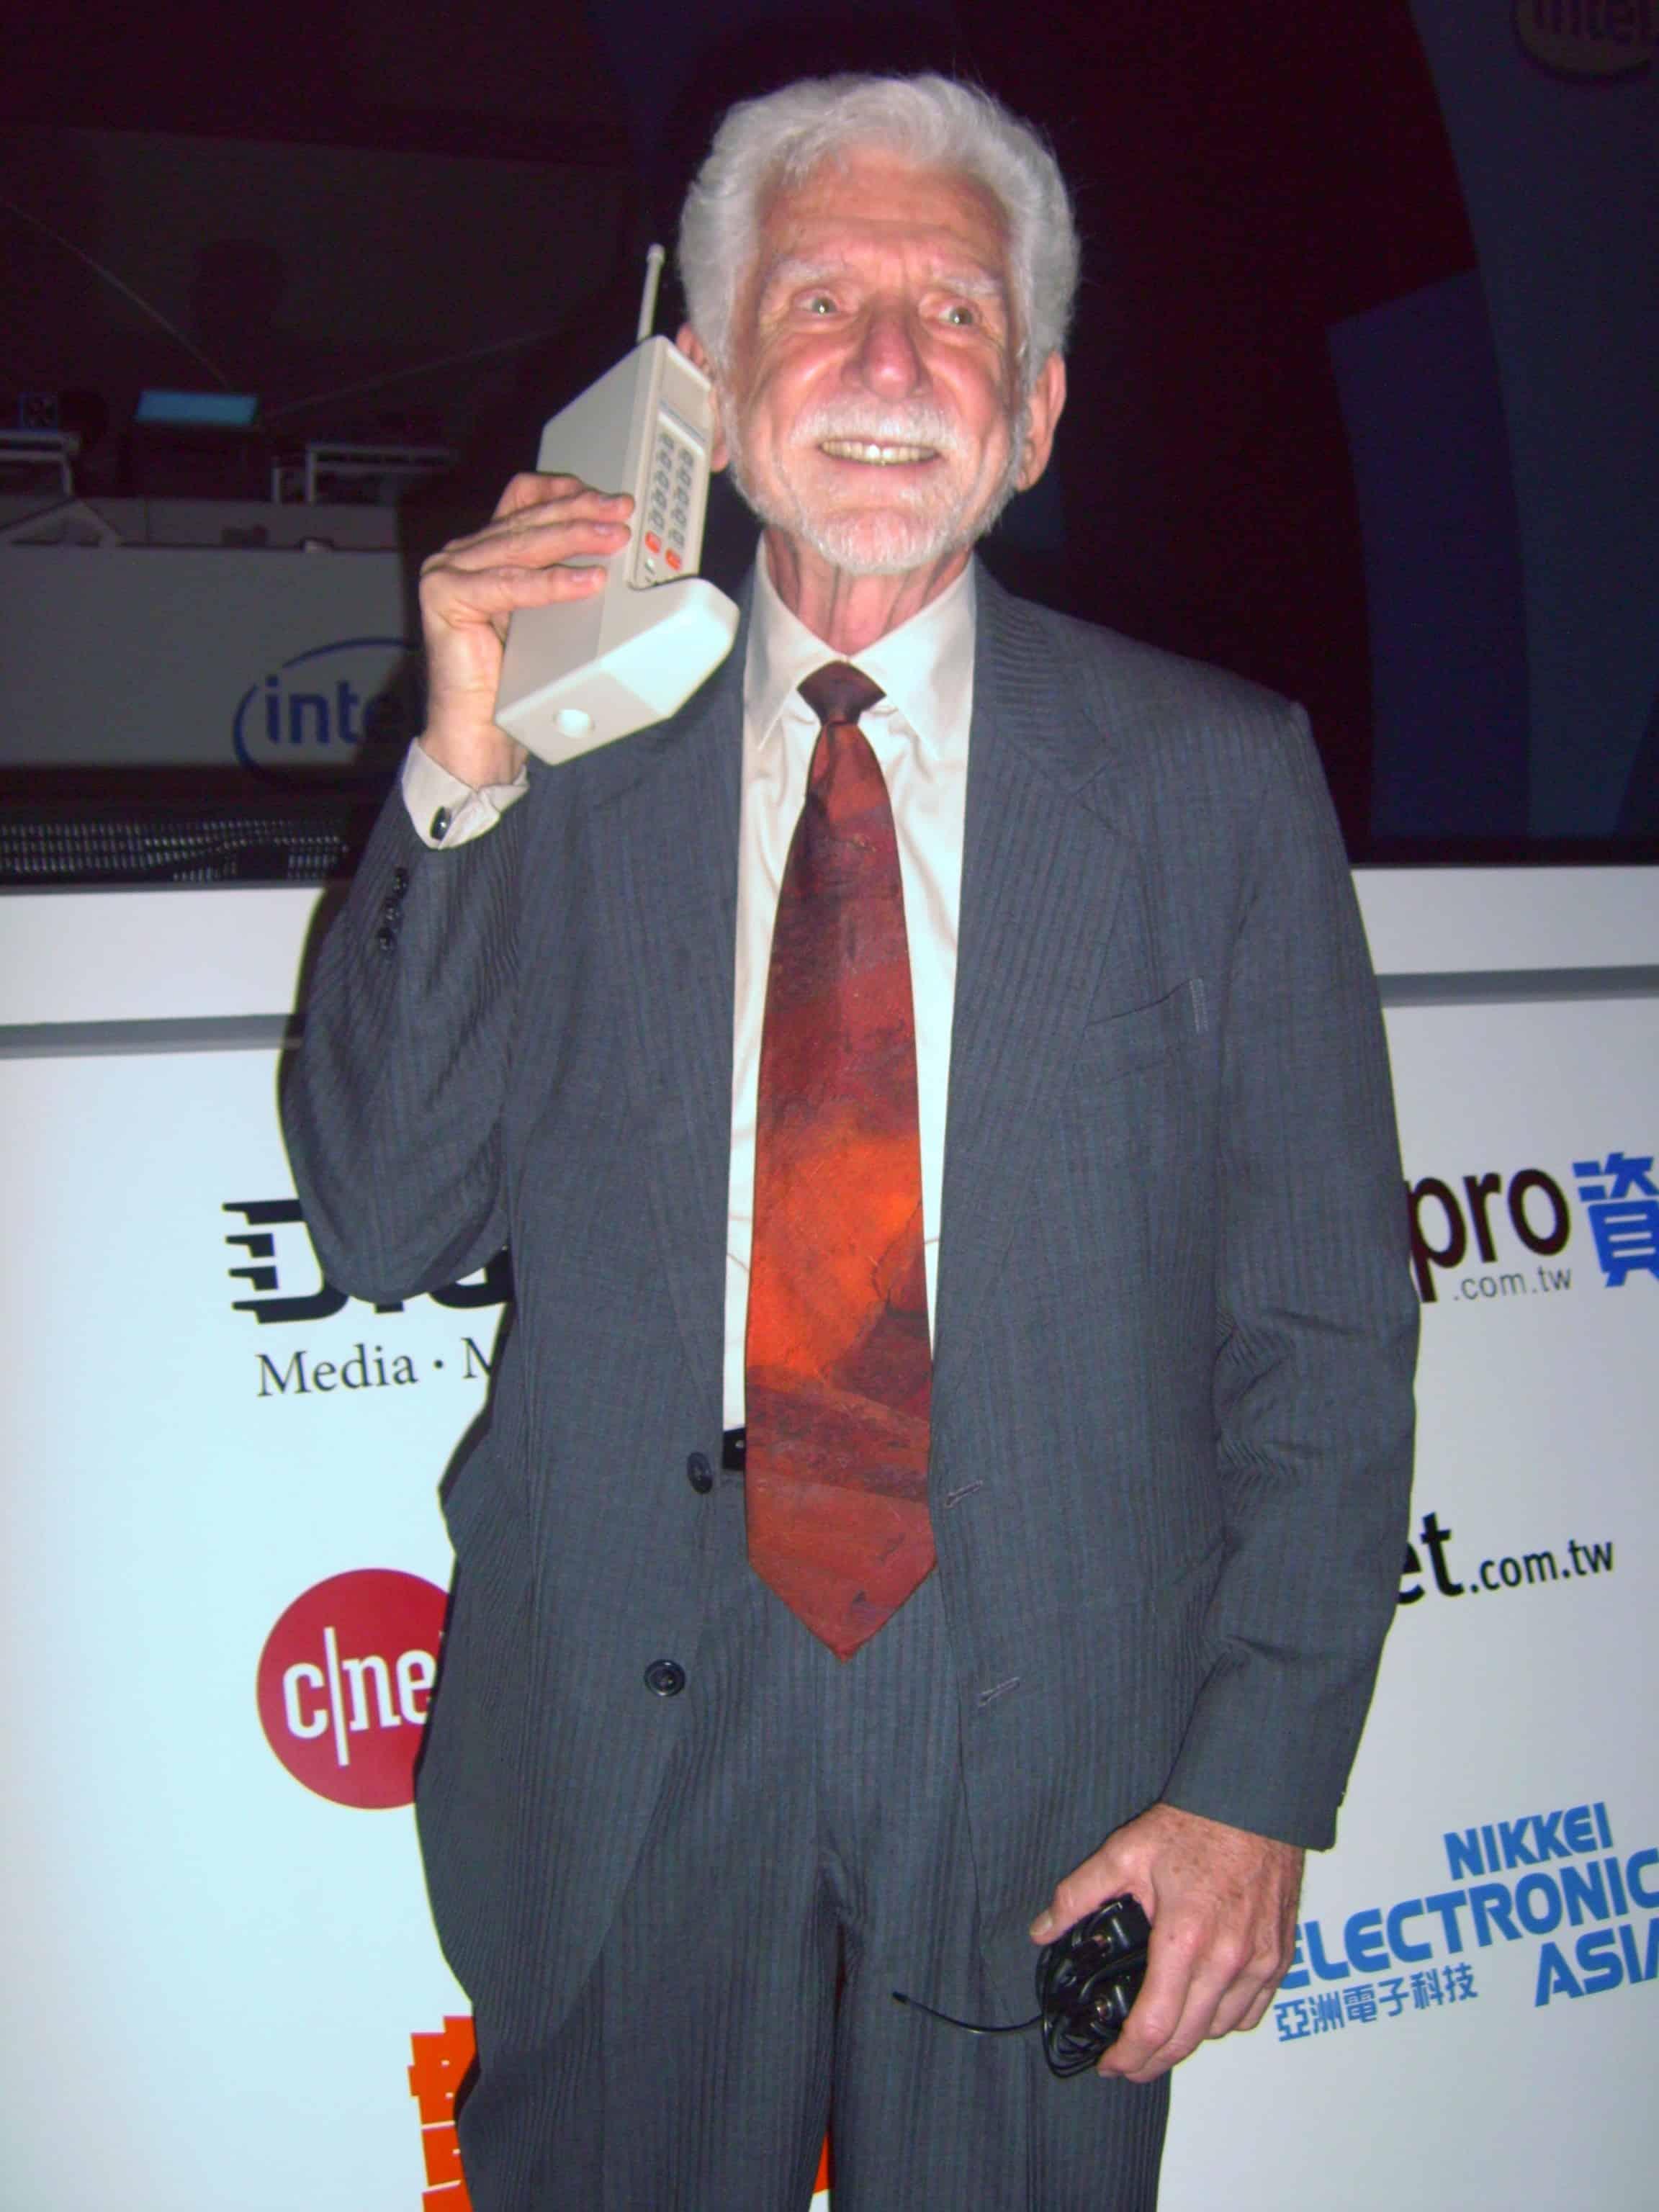 Image: Rico Shen | Dr. Martin Cooper in 2007 of Motorola in 2007 & Original DynaTAC Mobile Phone